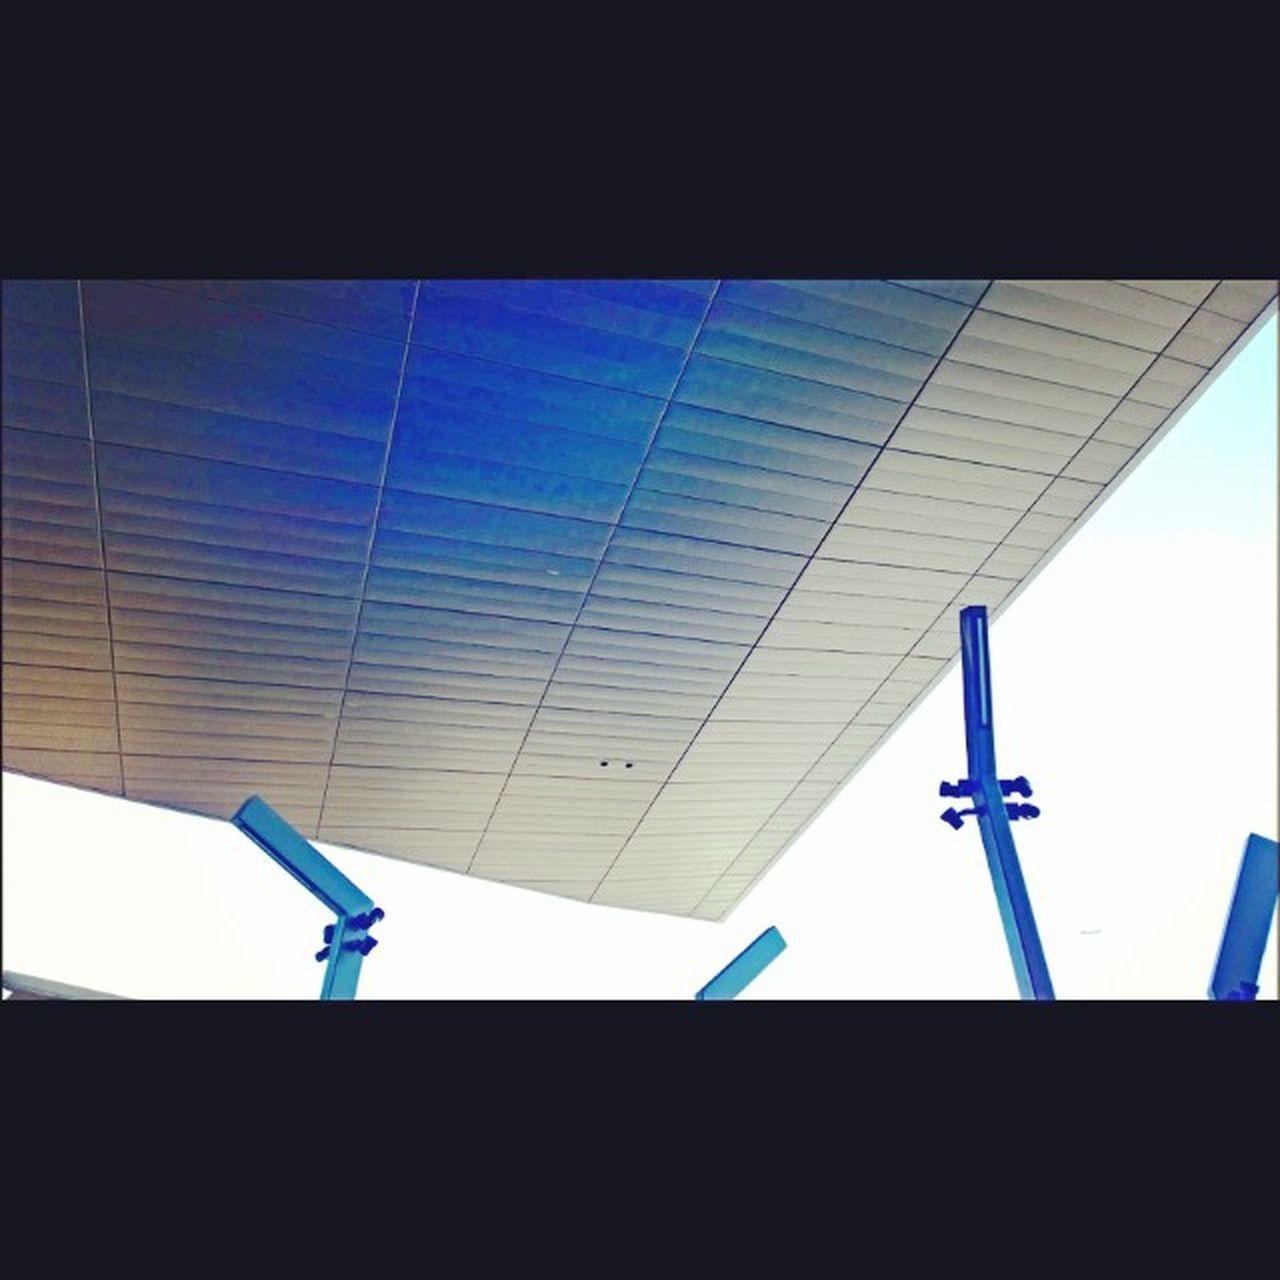 Architecture Angles Lumia1020 Nokia  wpphoto wp8au winphan